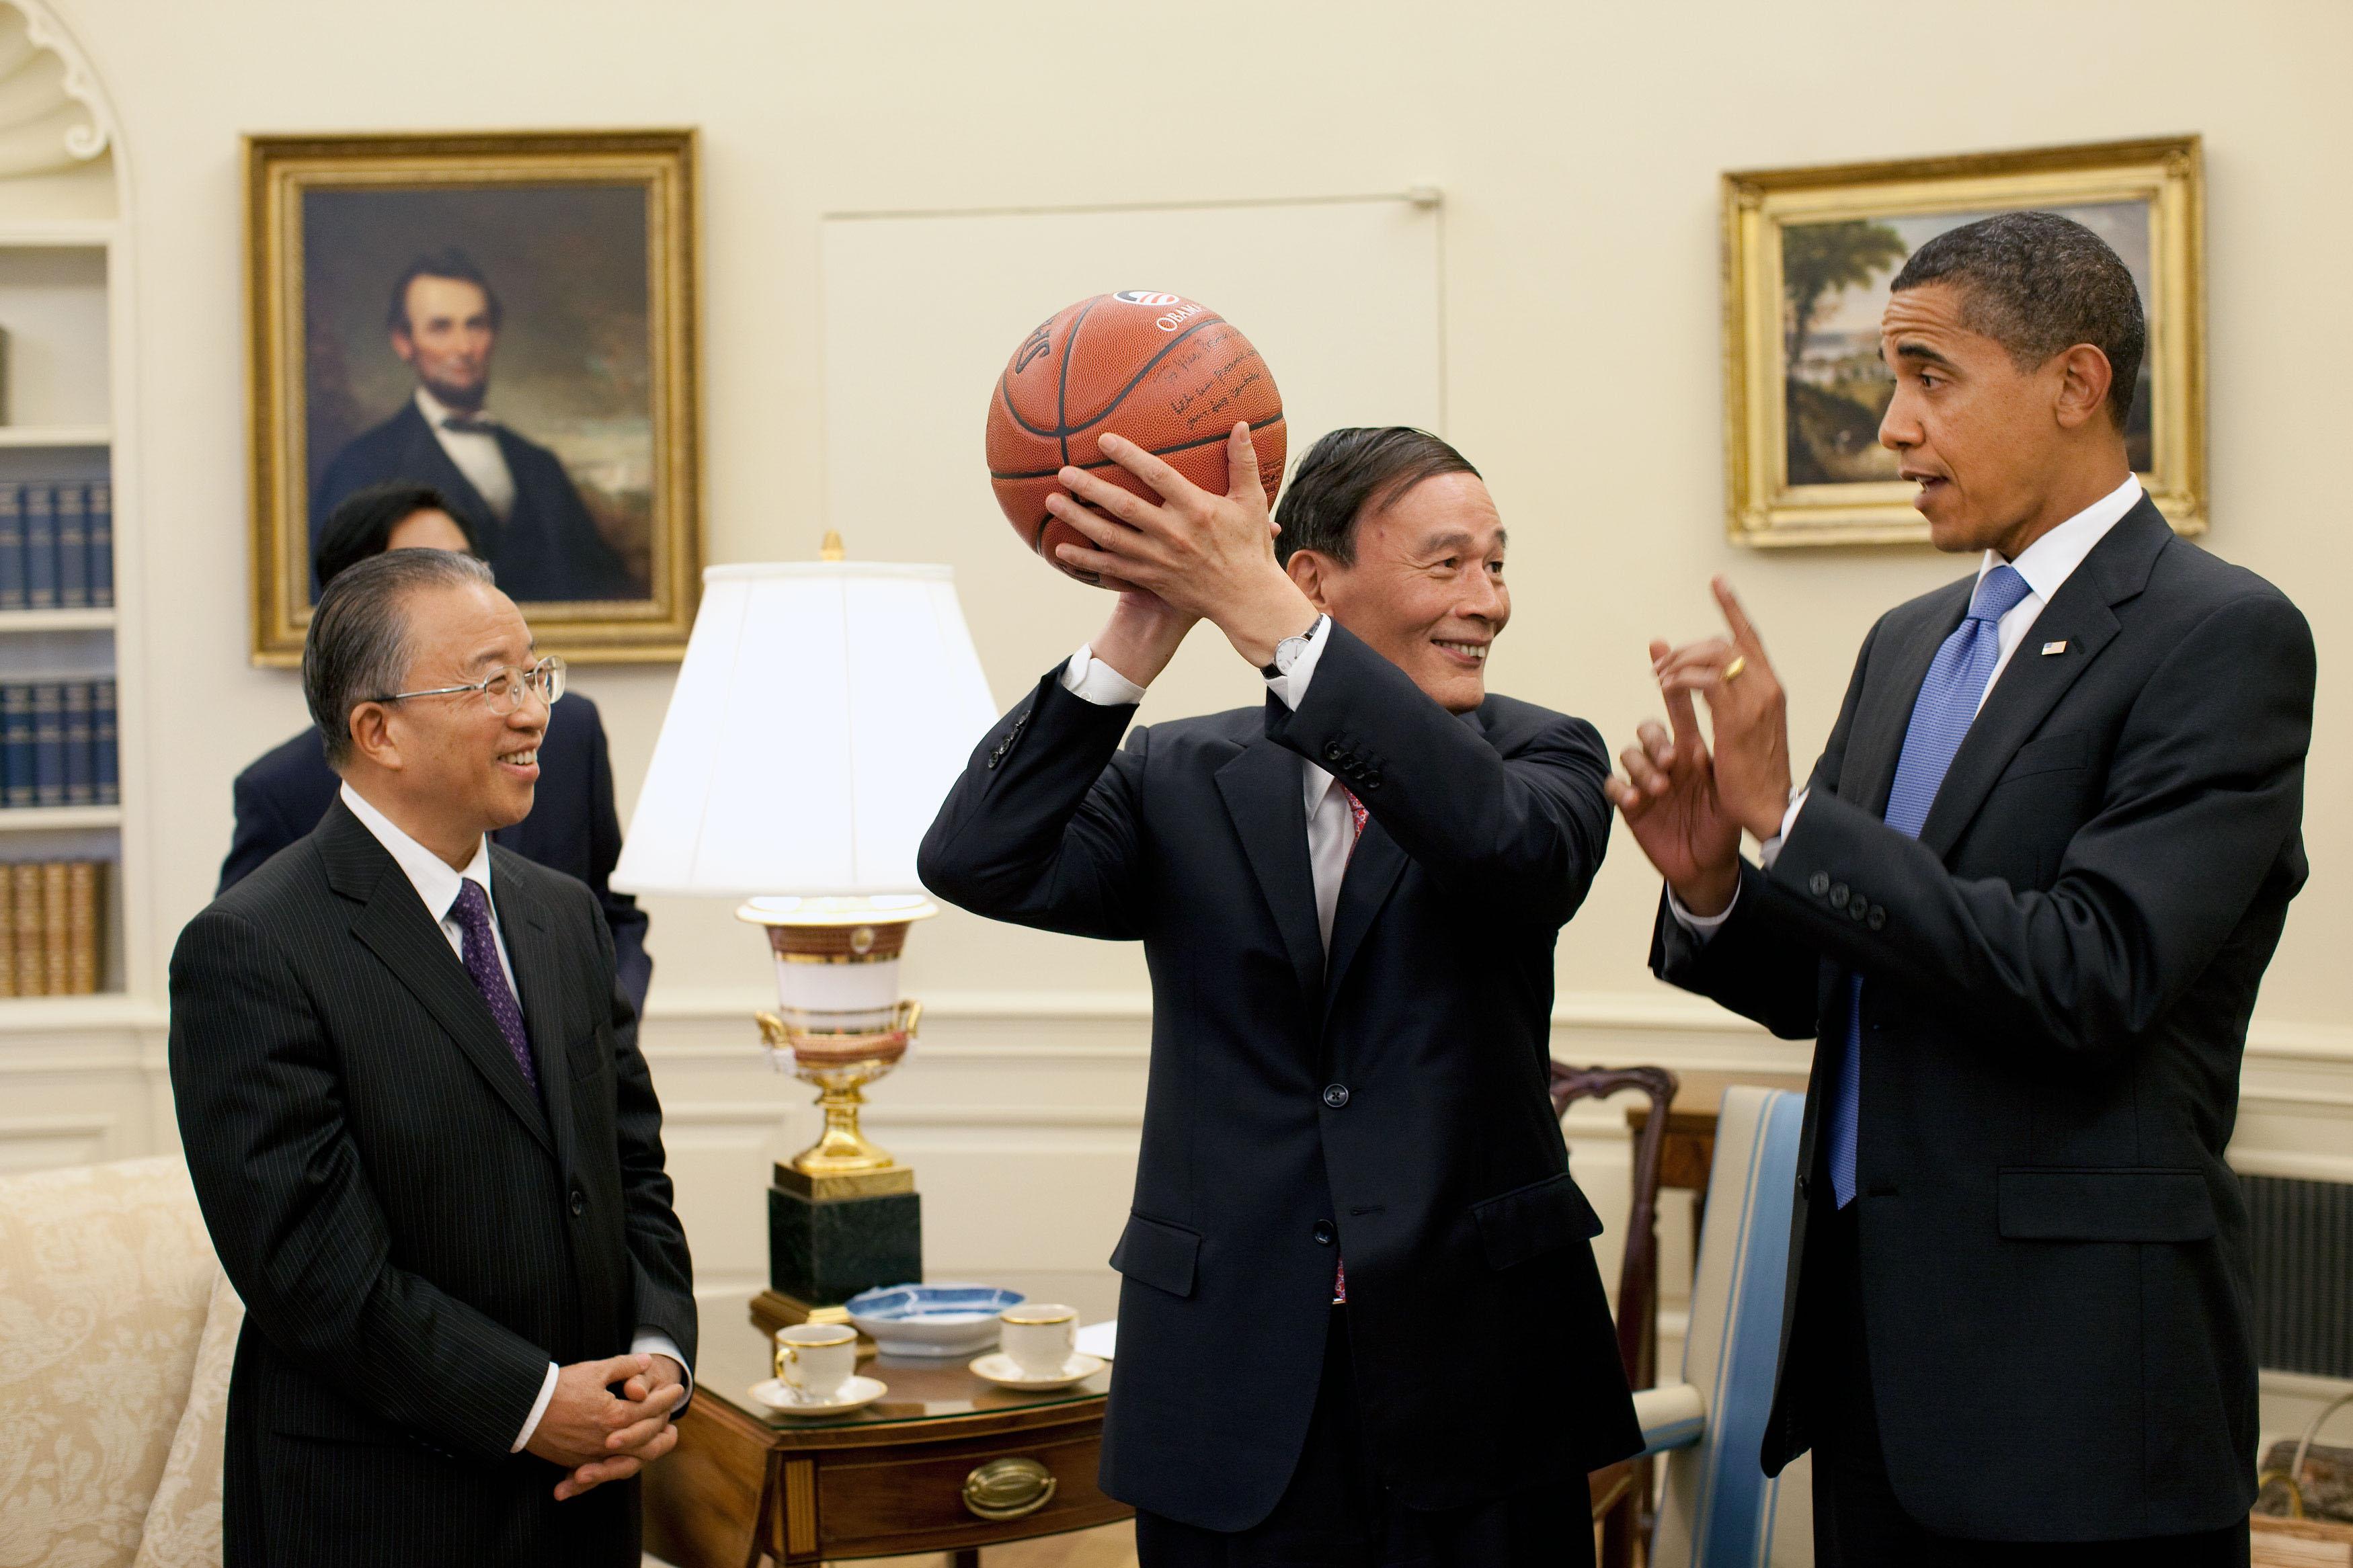 Obama Japanese School Girl - Viewing Gallery